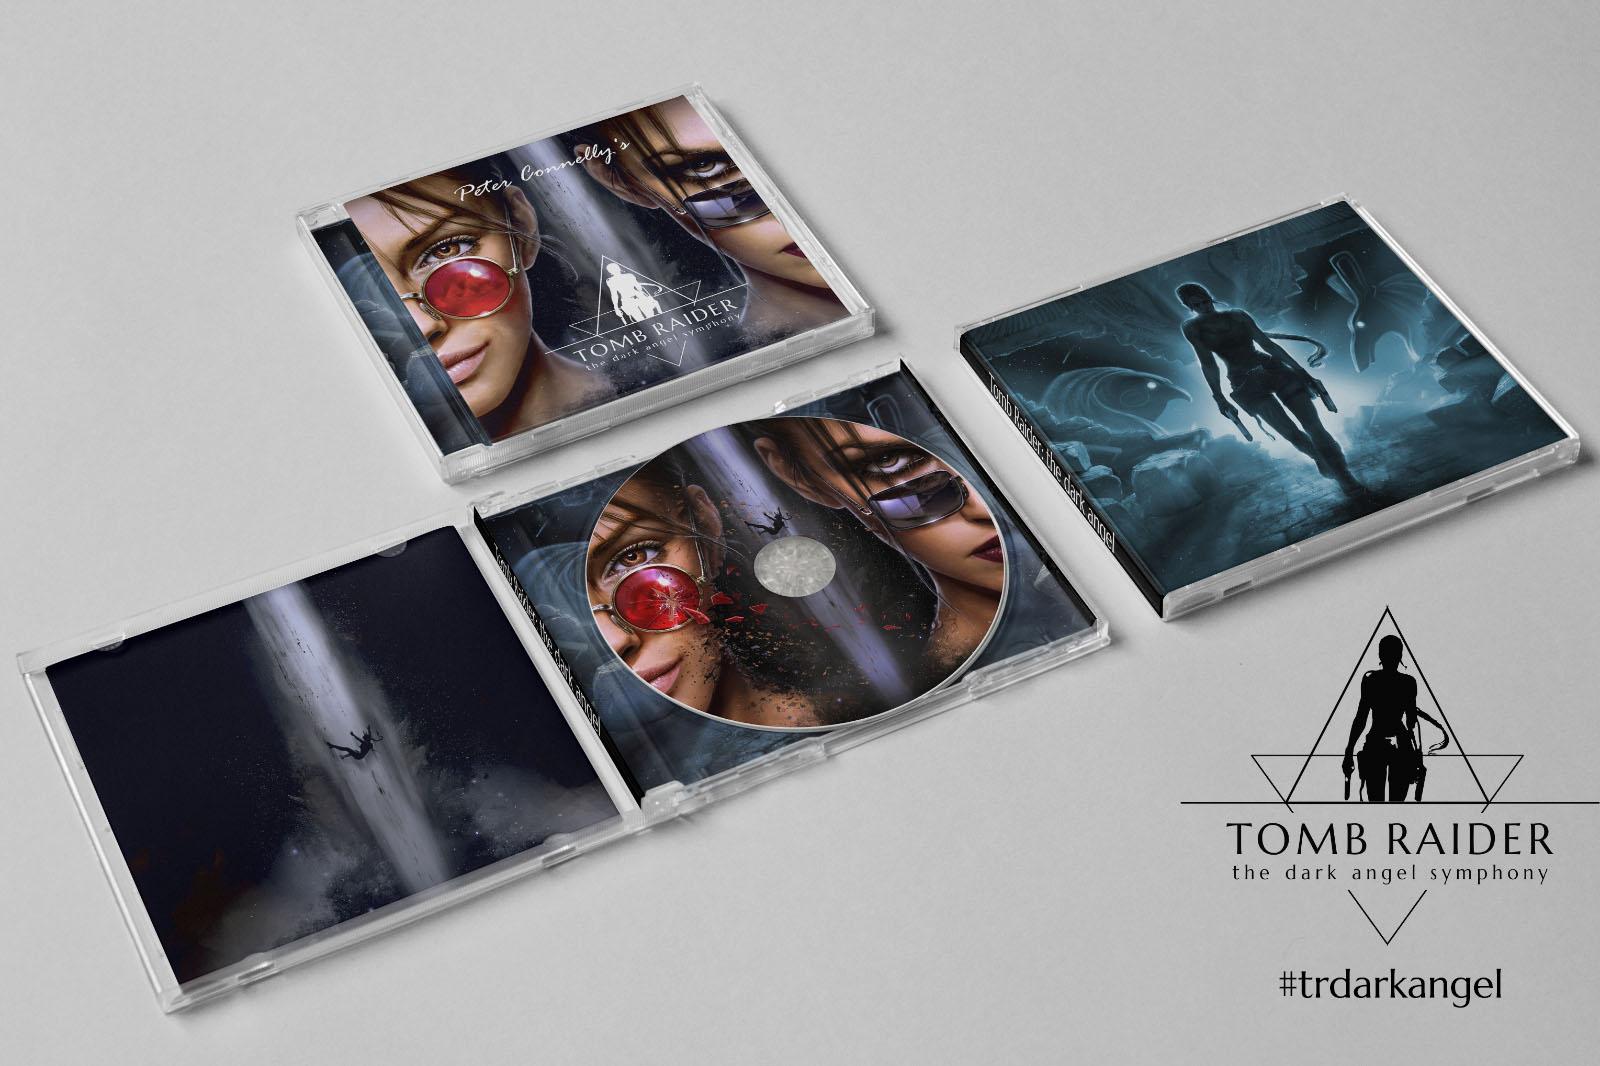 Bande Originale Tomb Raider : The Dark Angel Symphony